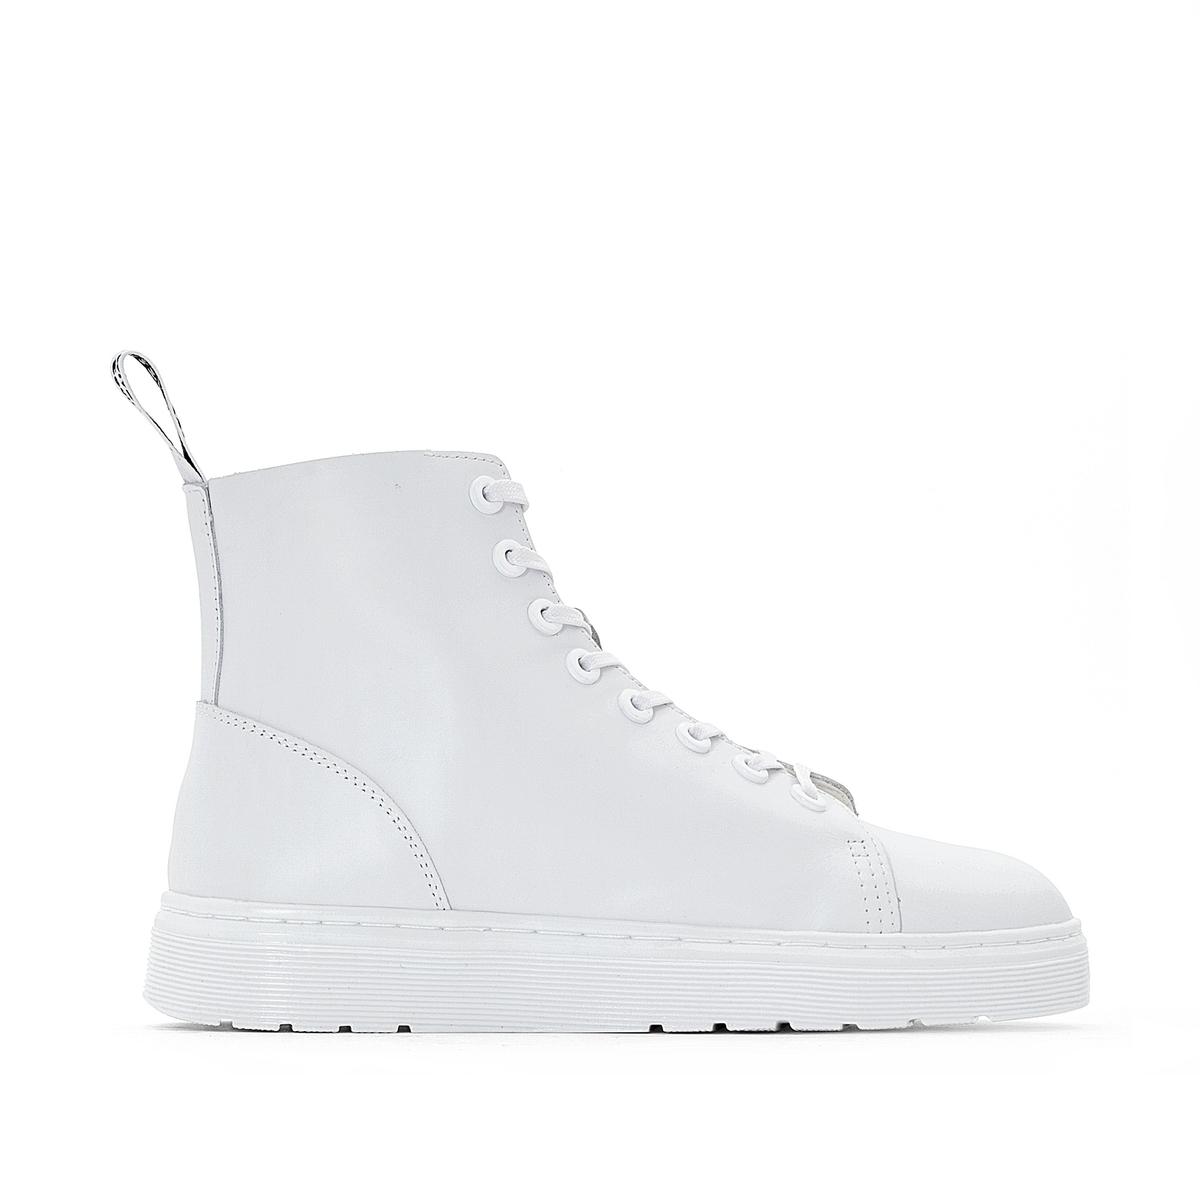 Ботинки кожаные на шнуровке Talib цены онлайн